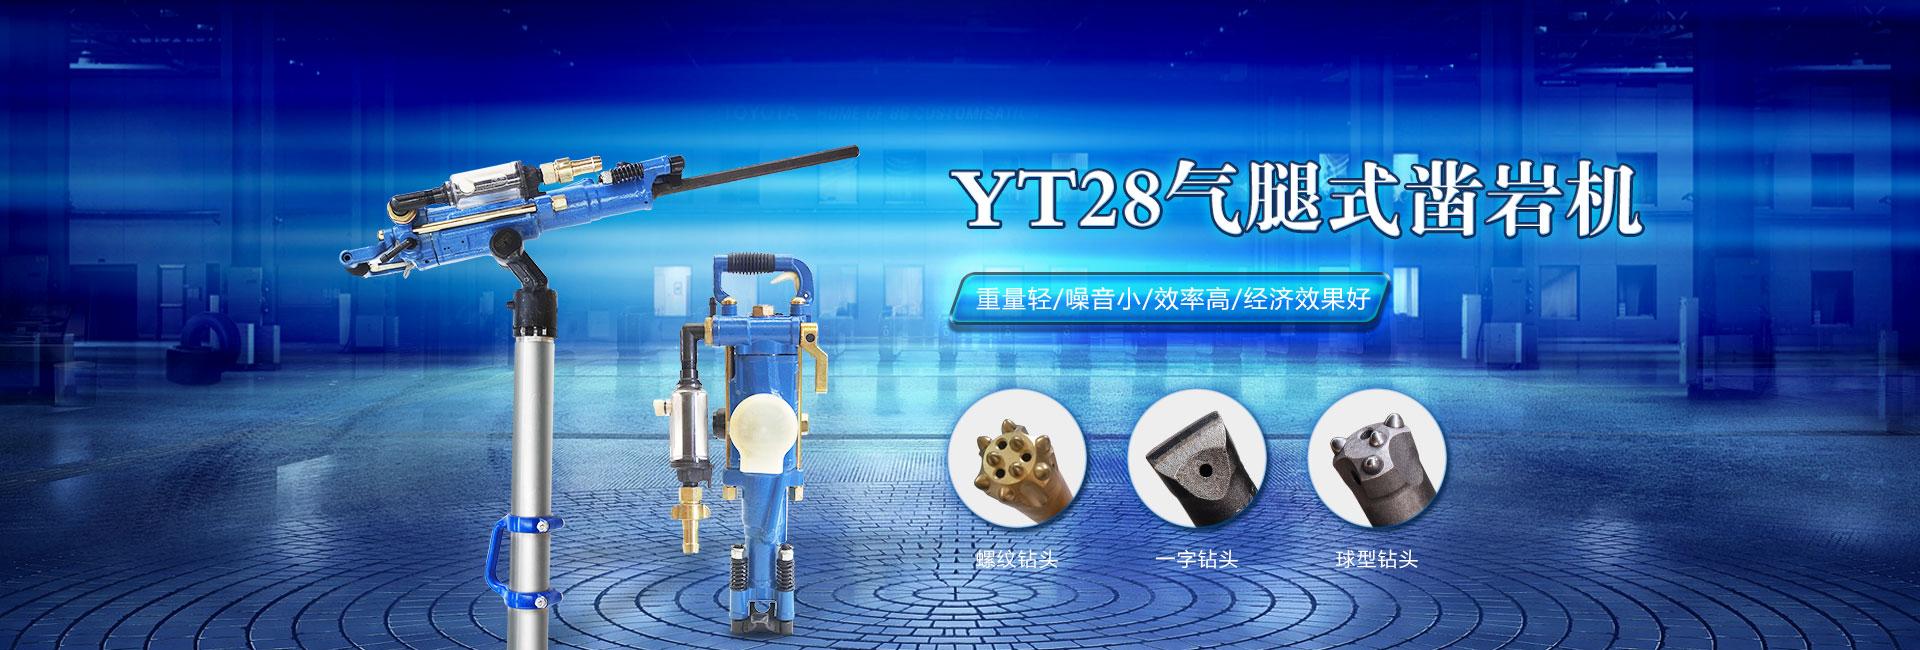 yt28凿岩机 28凿岩机价格 气腿式凿岩机